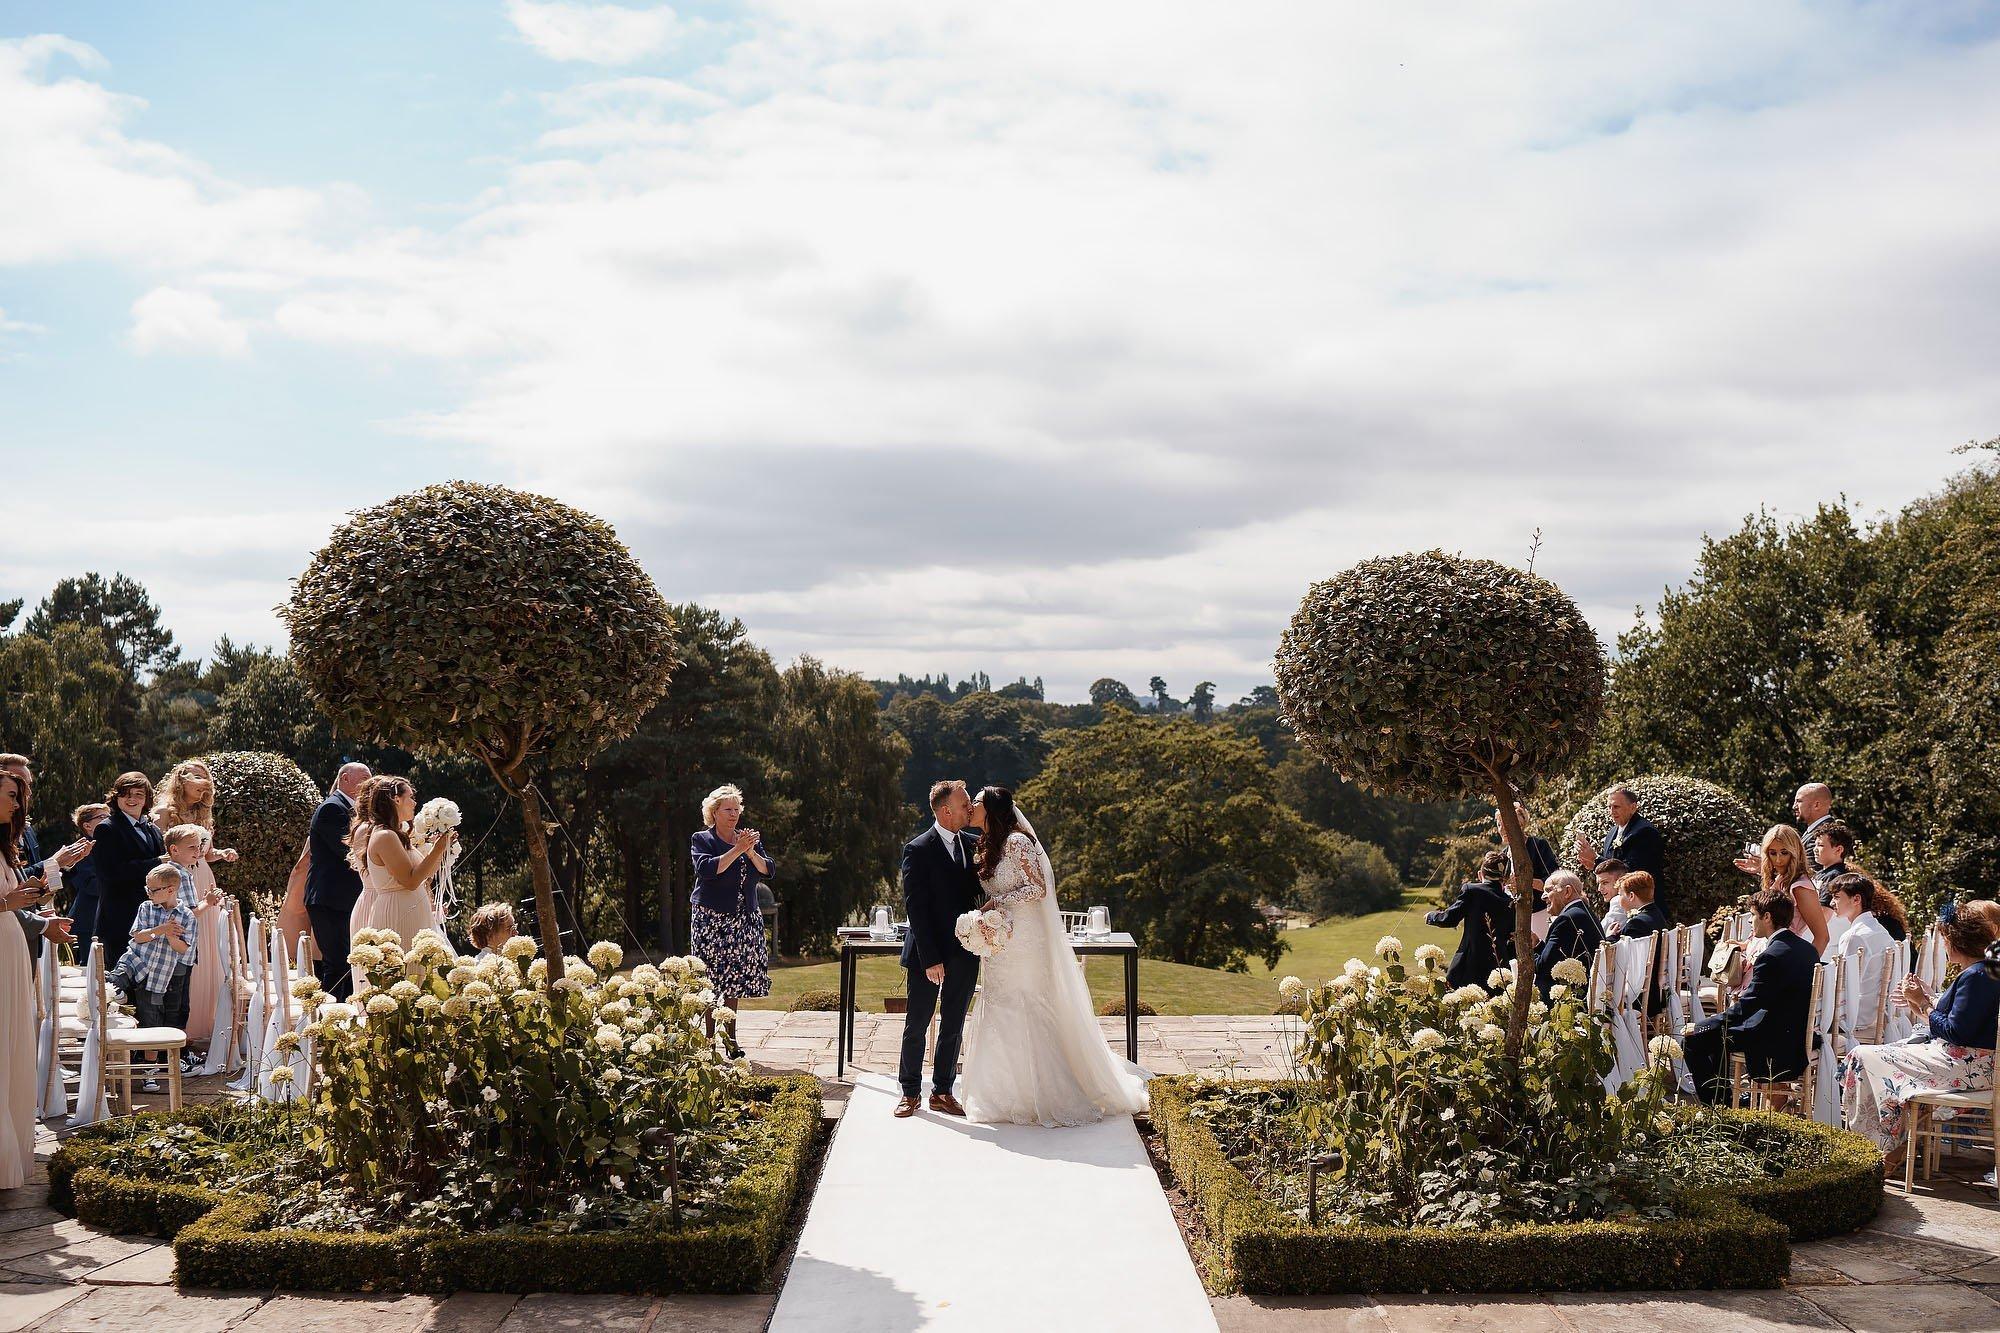 Delamere manor weddings 18